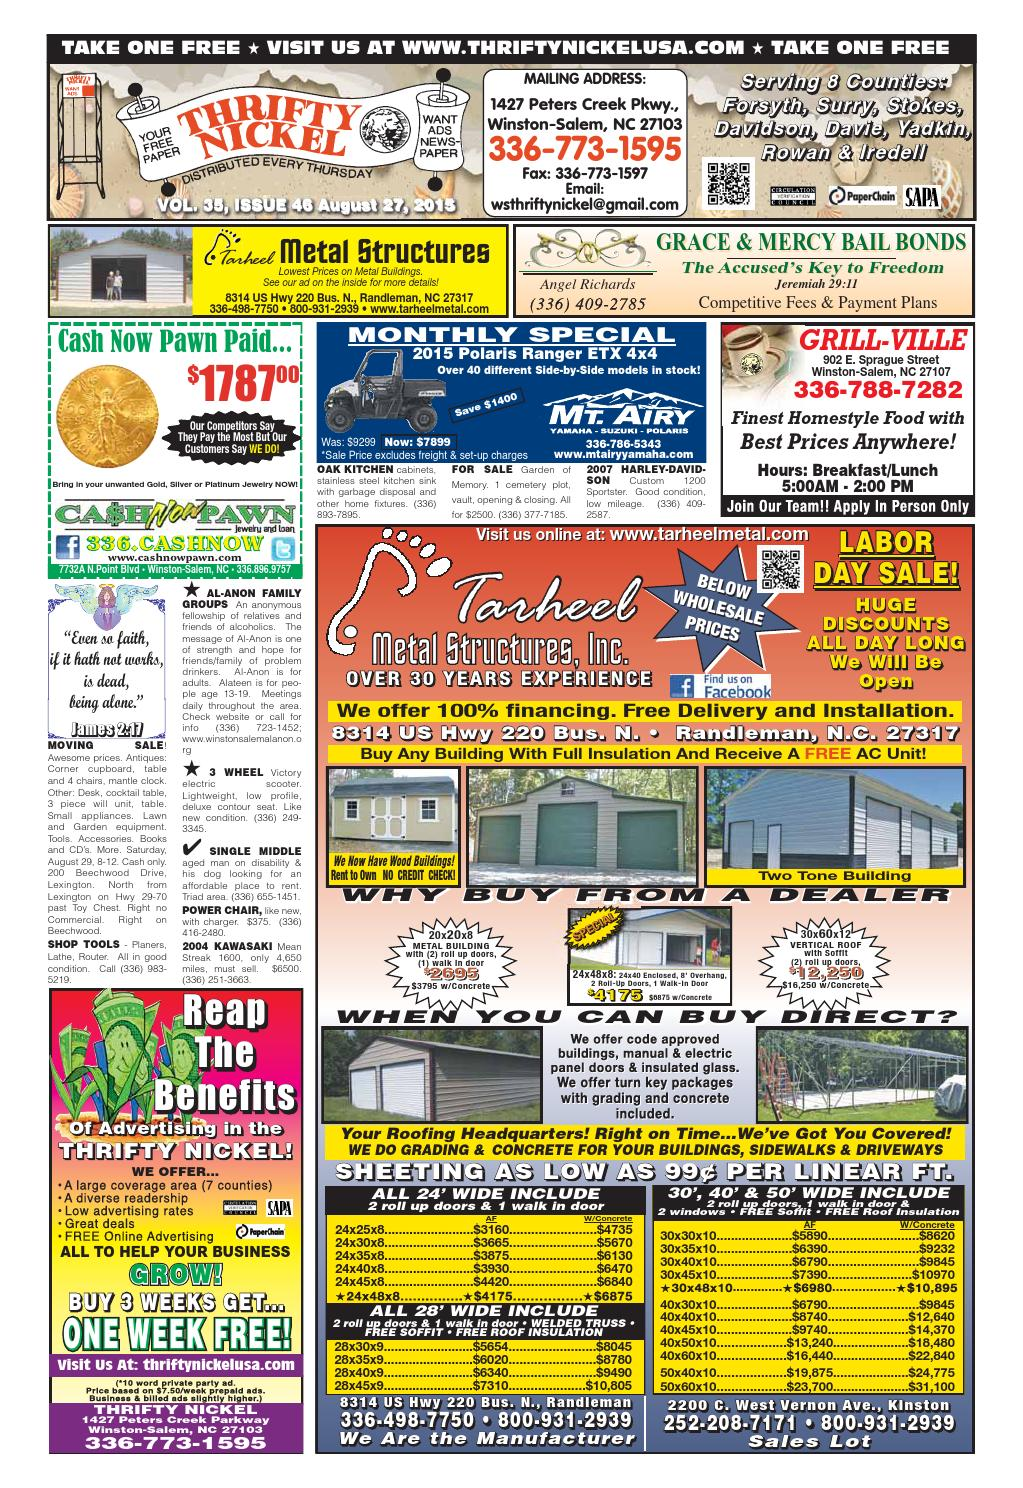 Winston salem thrifty nickel 08 27 15 by winston salem for Pub cash piscine